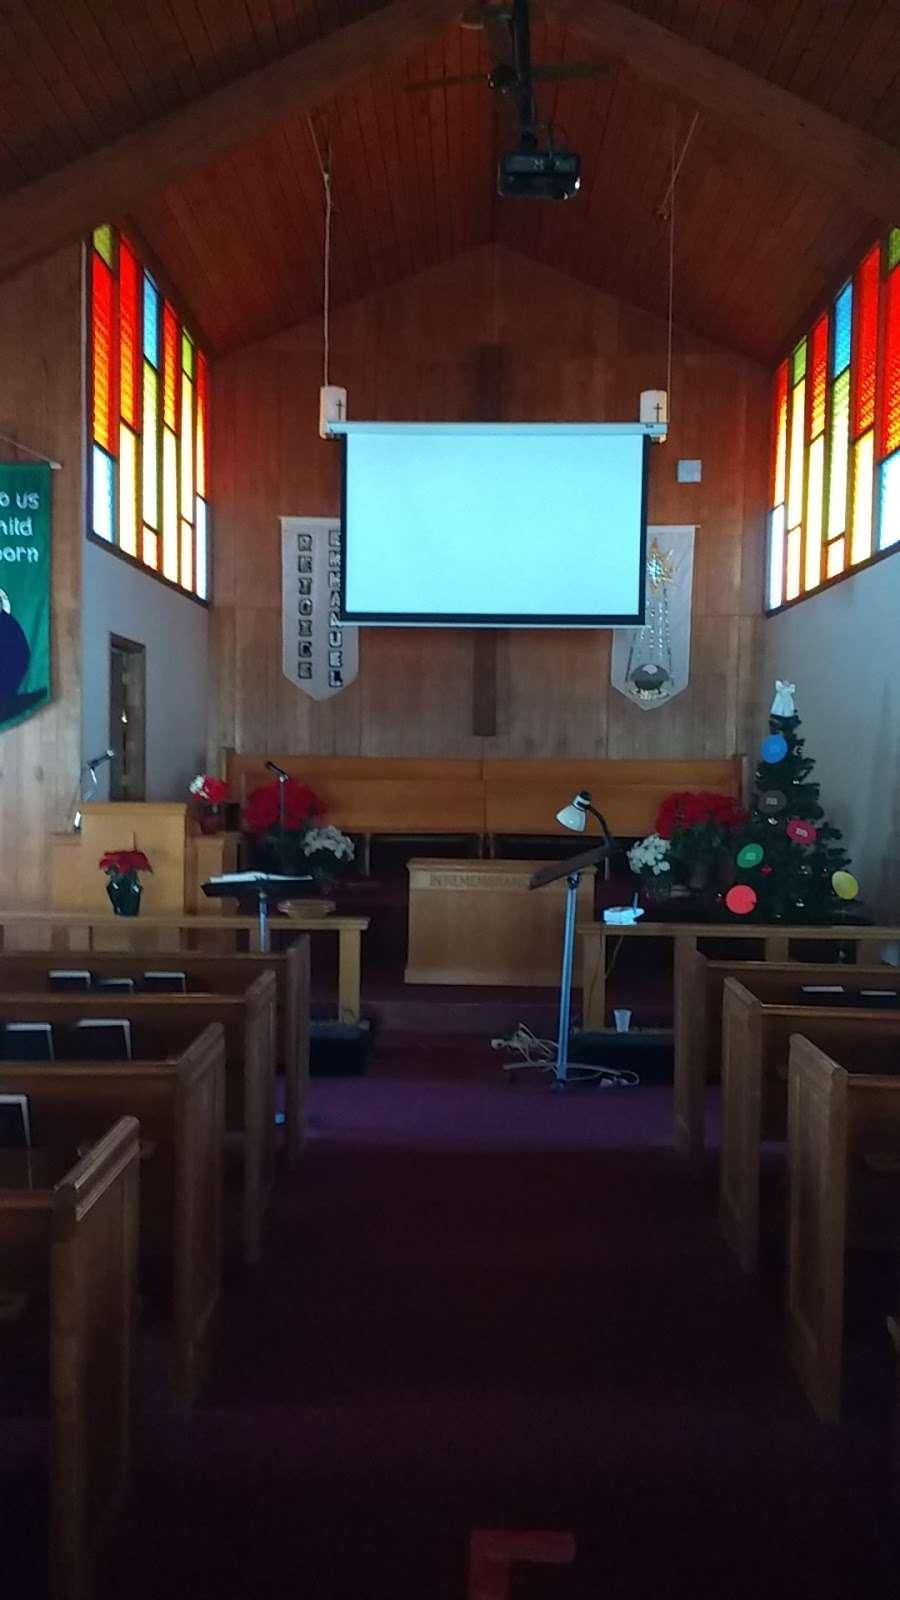 Lakeville Church of Nazarene - church    Photo 2 of 4   Address: 180 Main St, Lakeville, MA 02347, USA   Phone: (508) 946-5287